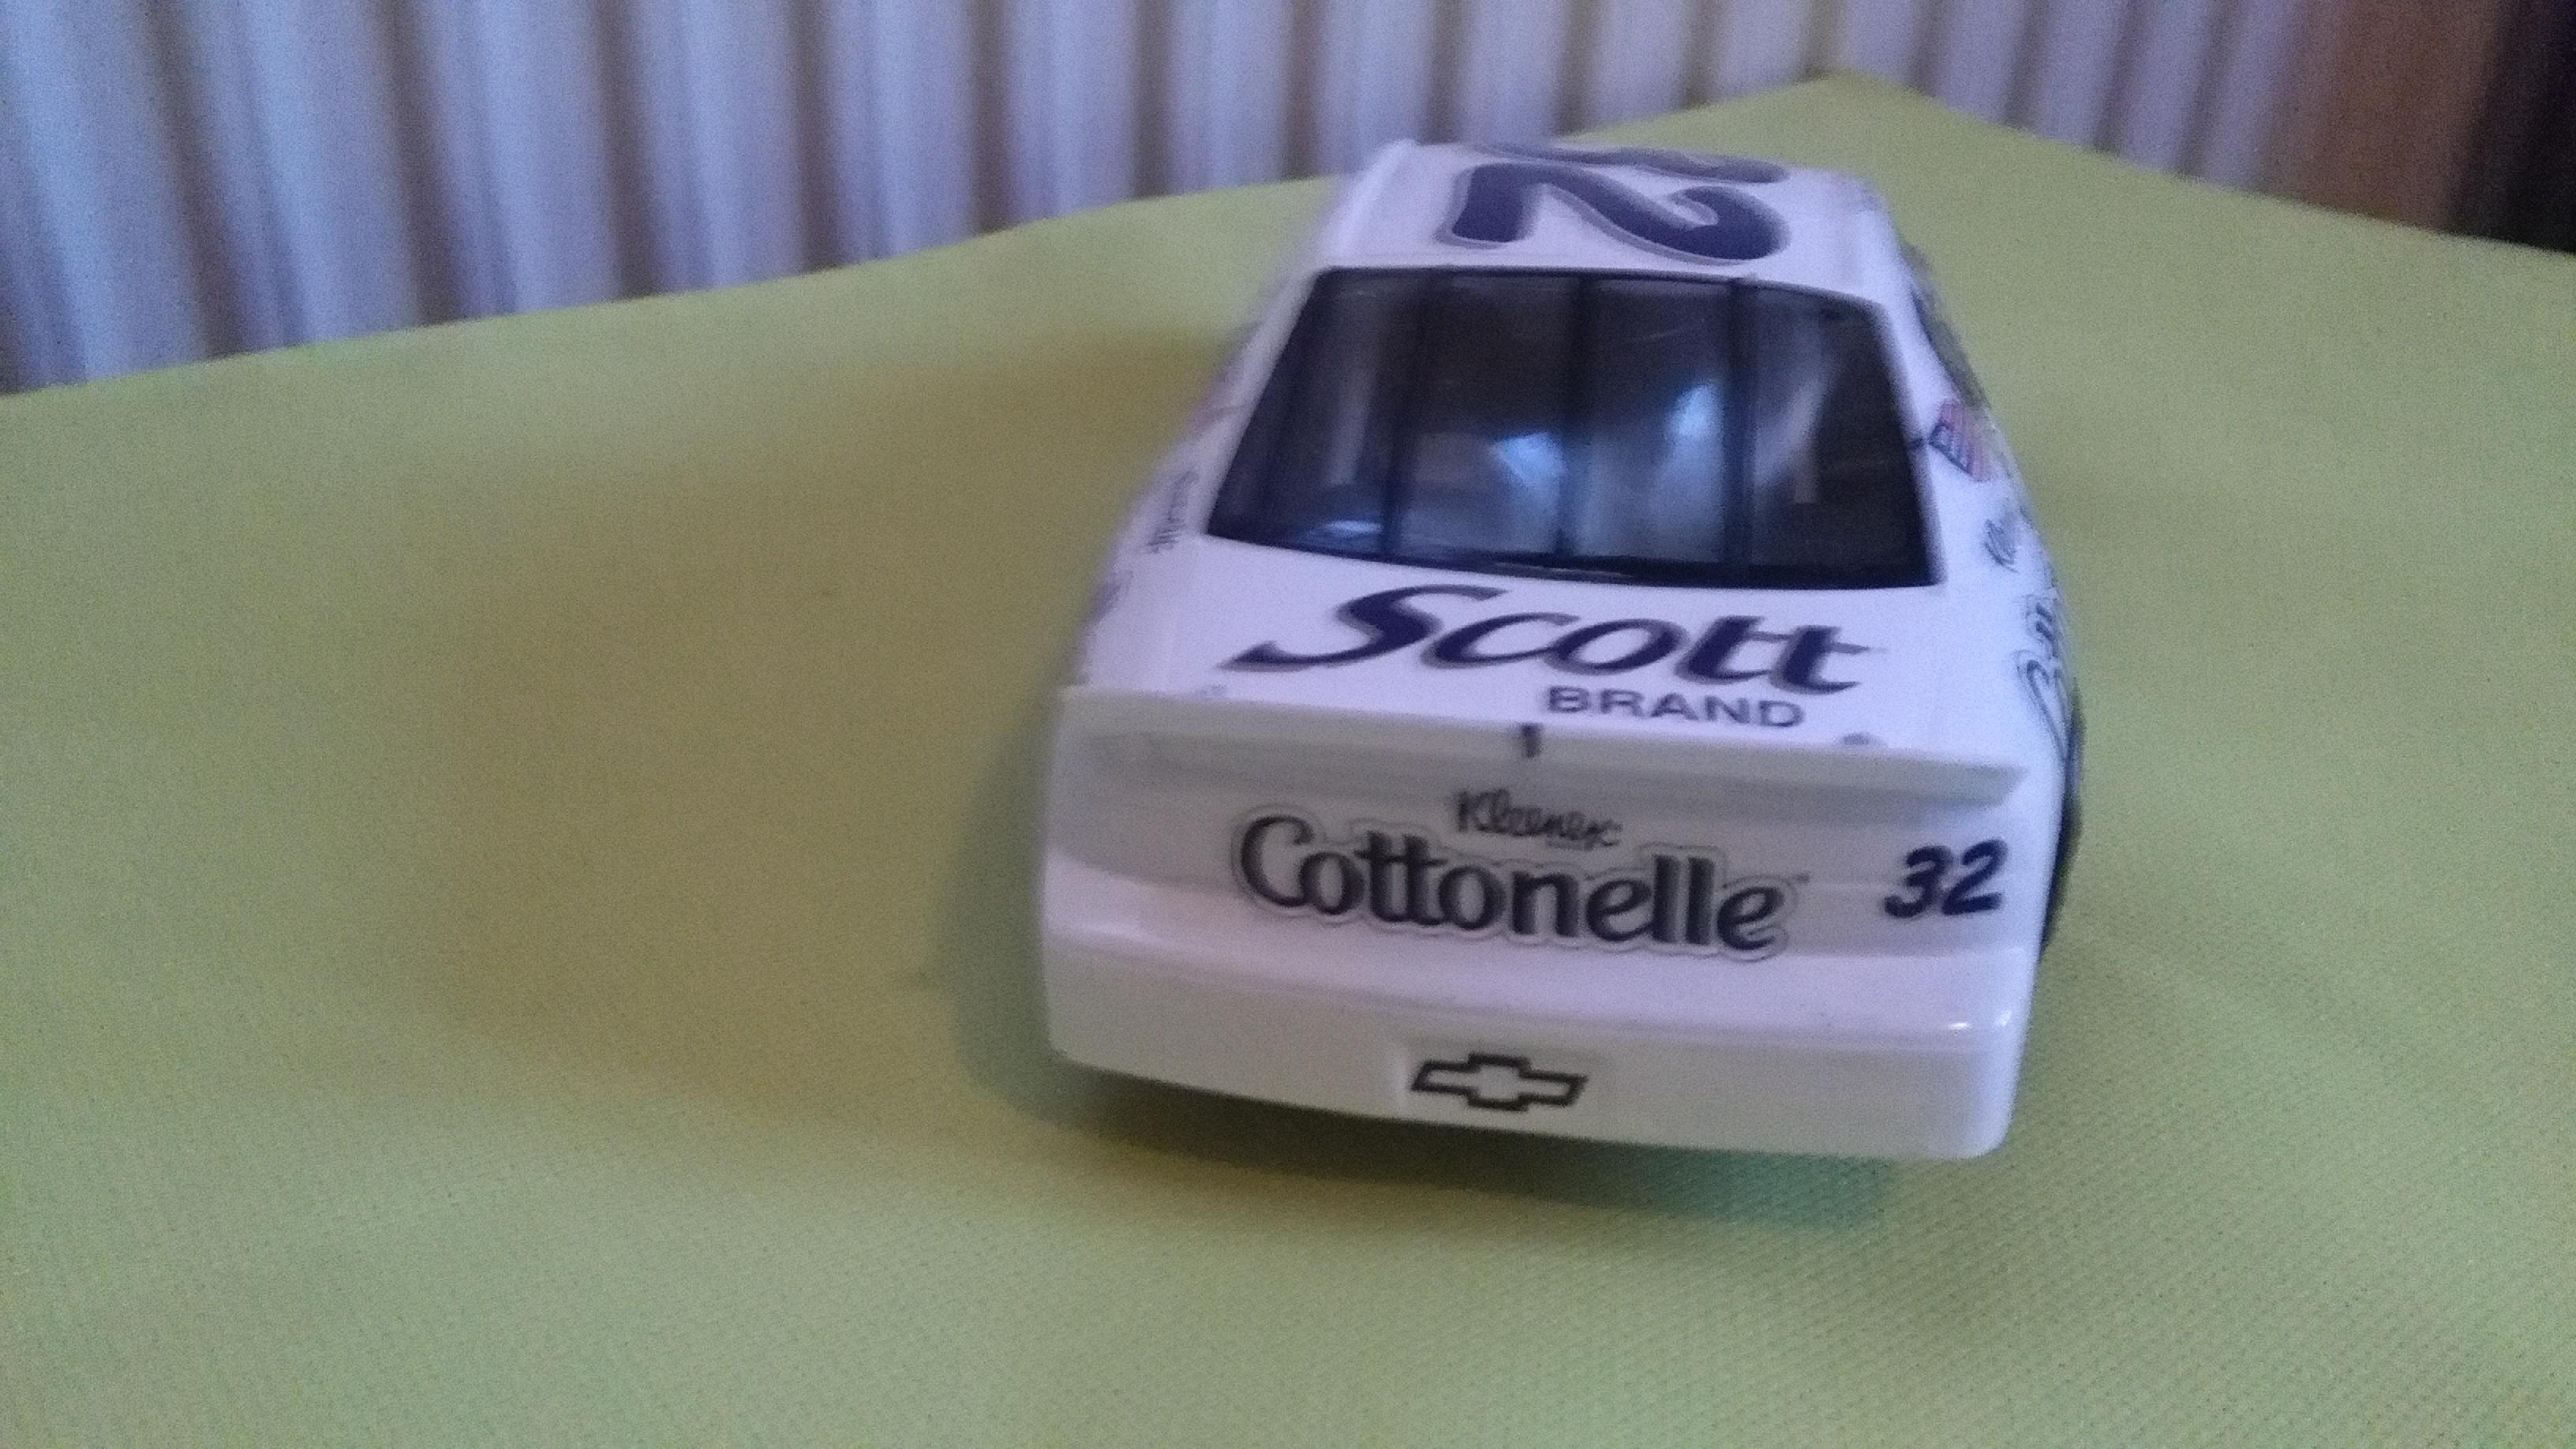 Chevy Monte-Carlo 1998 #32 Jeff Green Kleenex-Cottonelle   663879IMG20160207171316